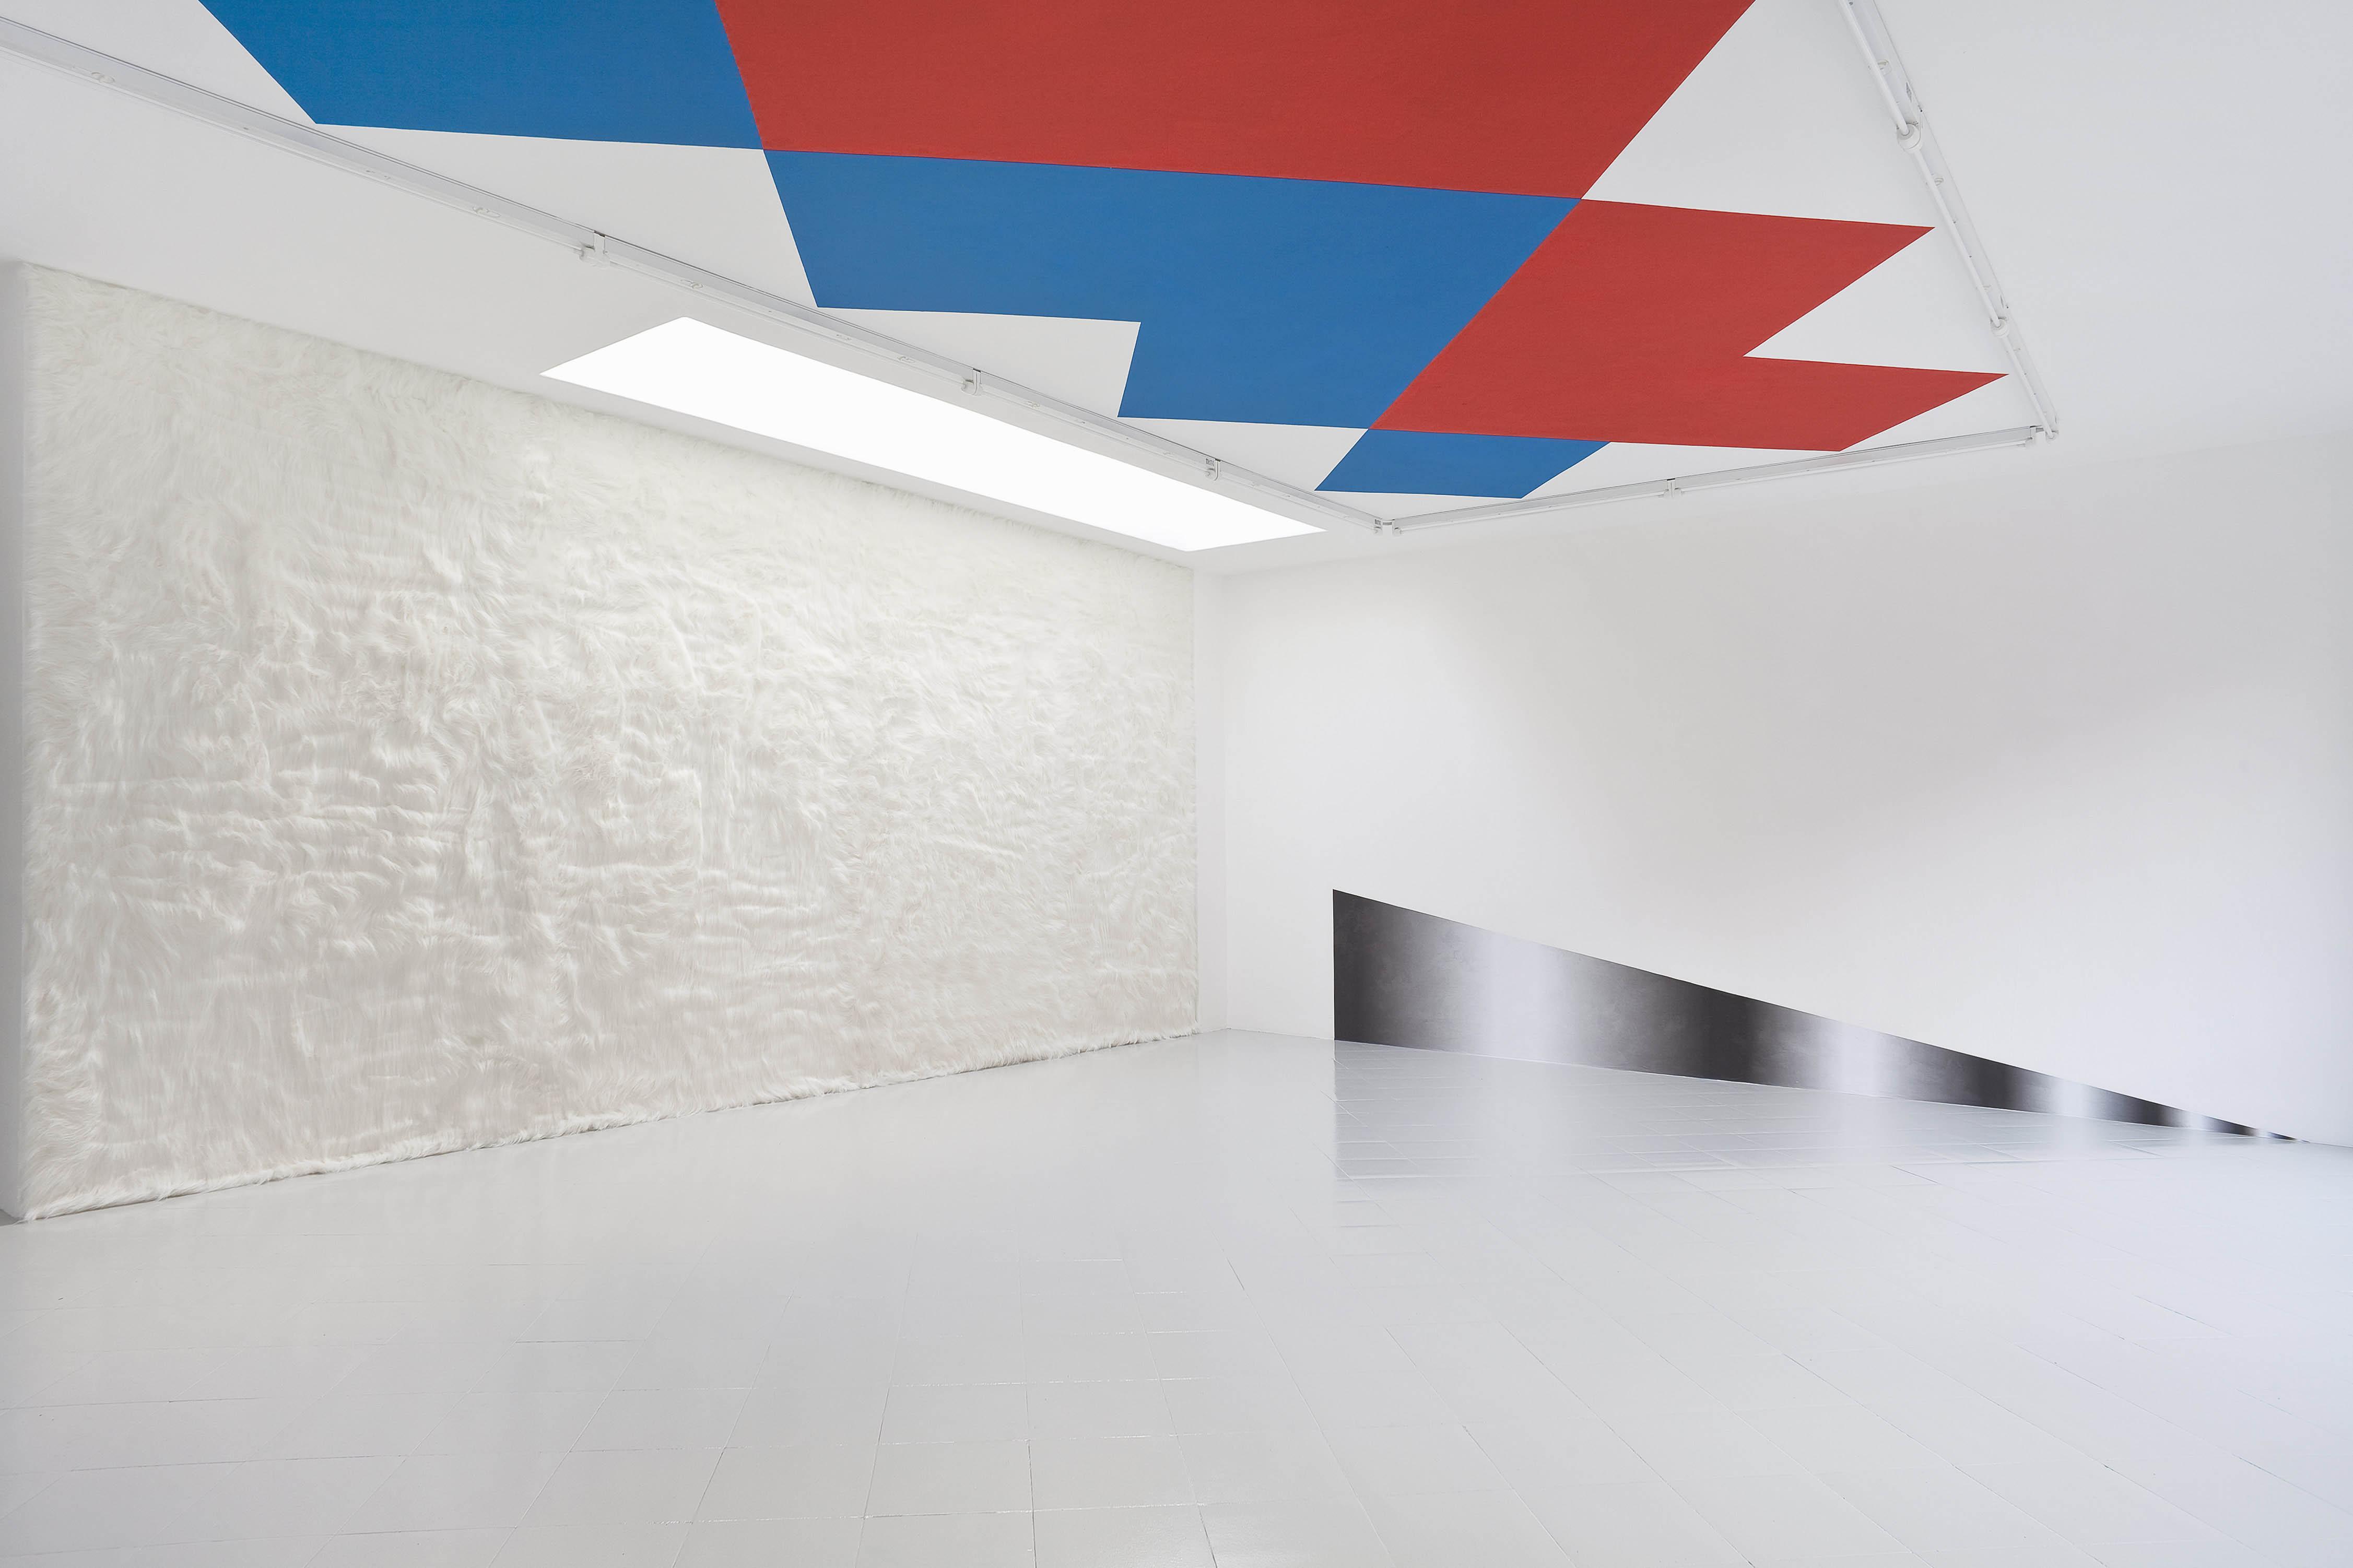 Warp & Weft, Sylvie Fleury - Alexander Wagner, 2013 - Spazio Cabinet, Milan, photo Filippo Armellin